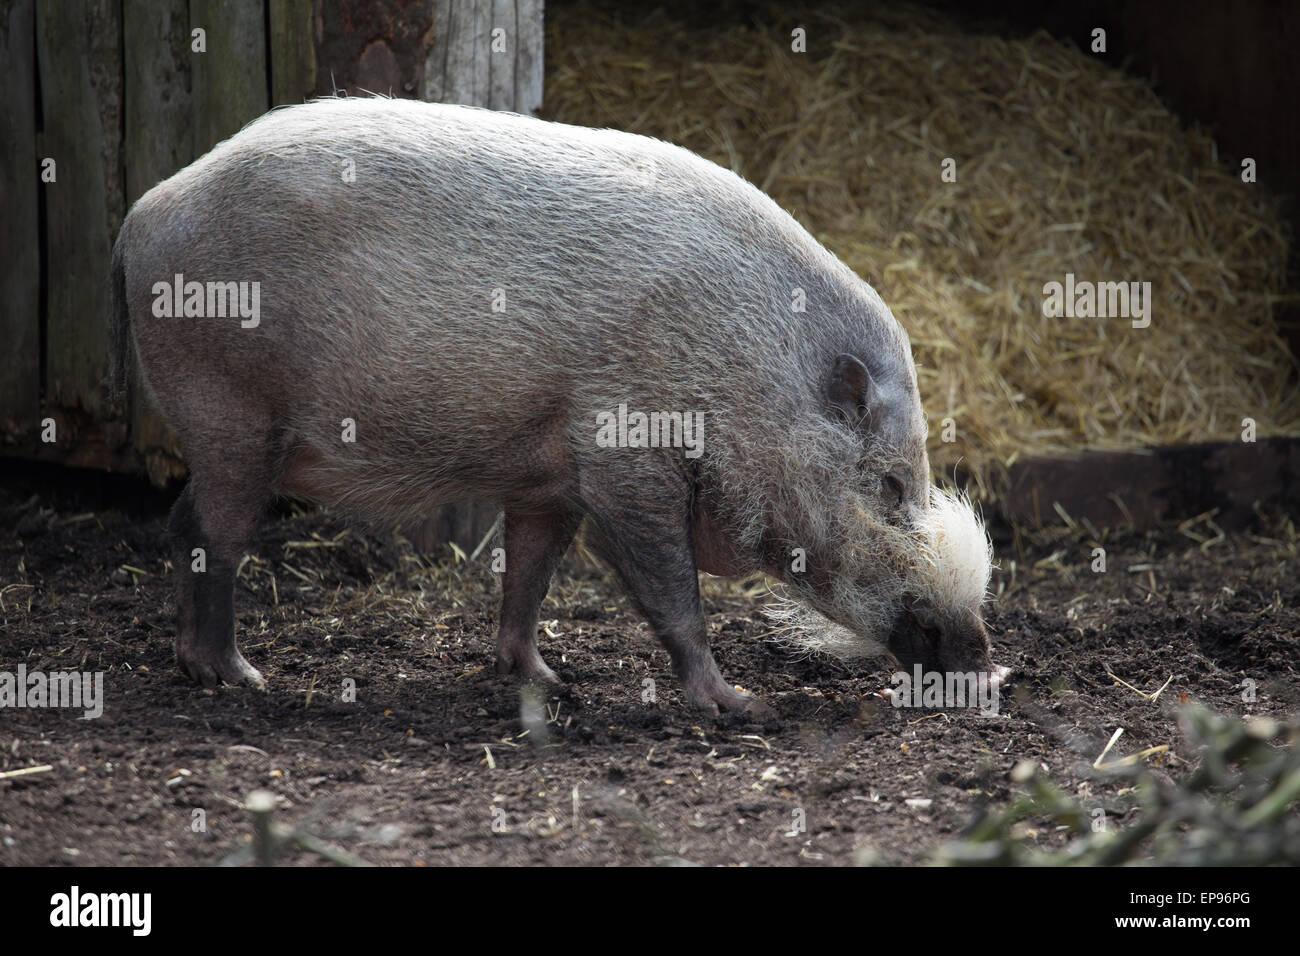 Wild Pig - Stock Image